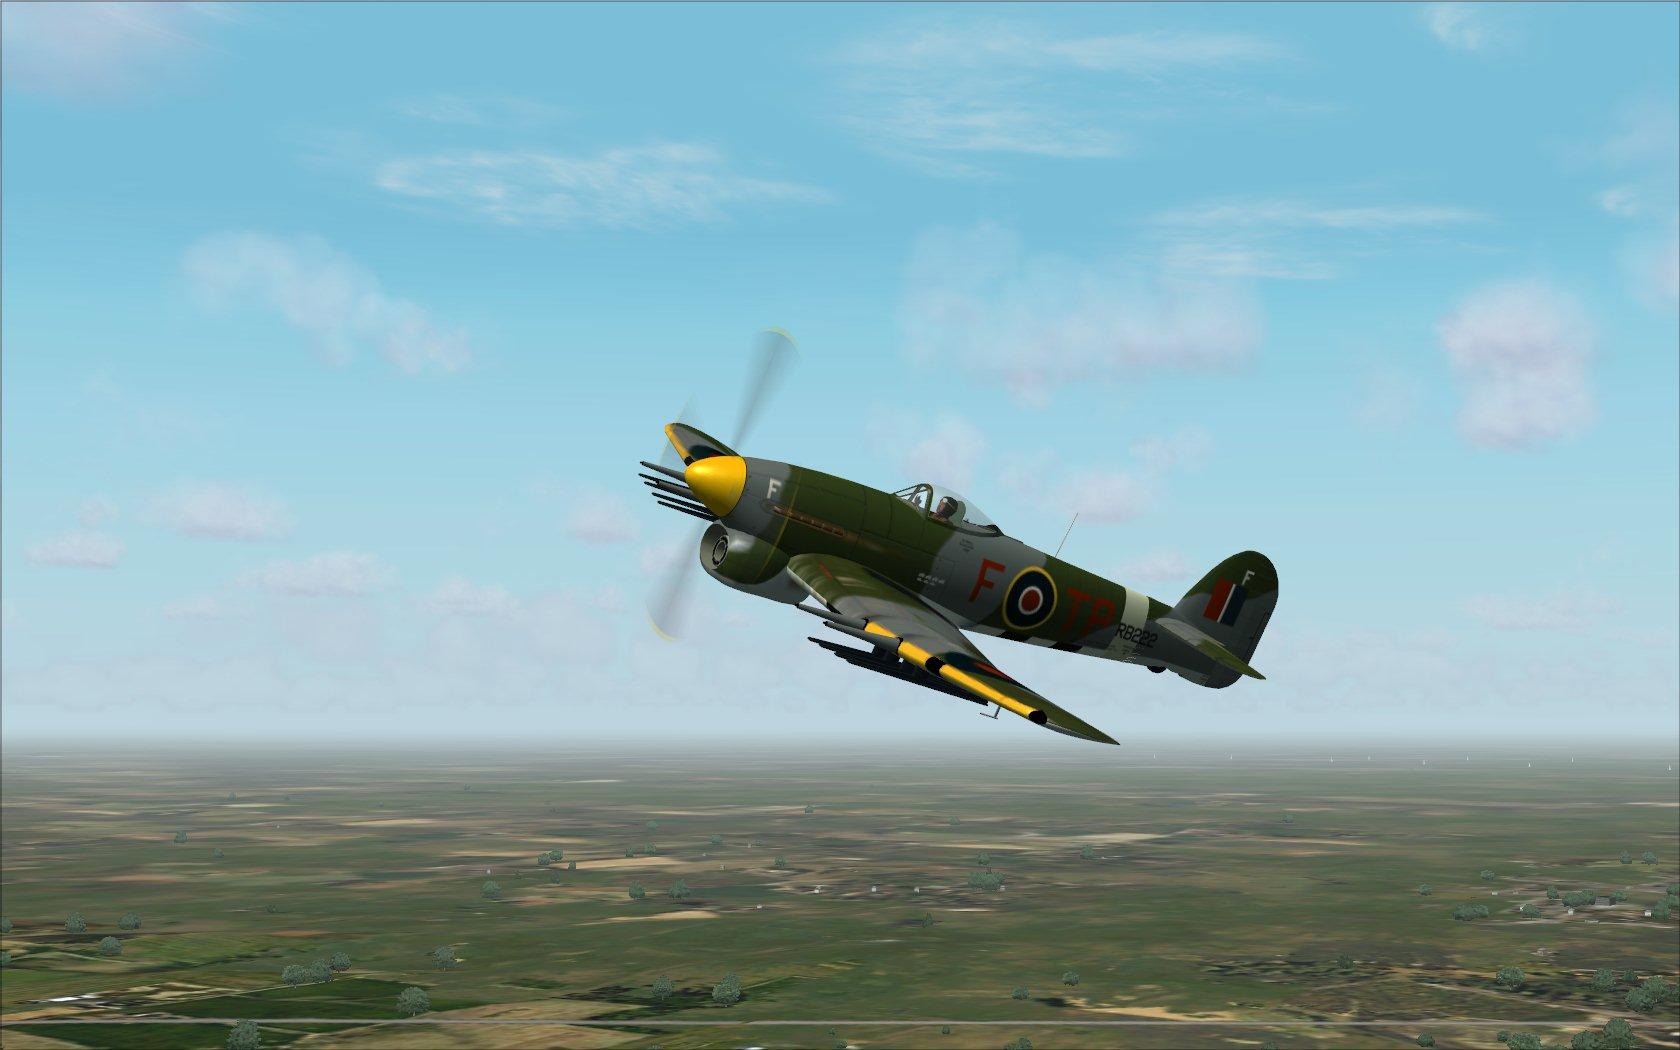 fs-freeware net - FSX Acceleration Hawker Typhoon Mk I